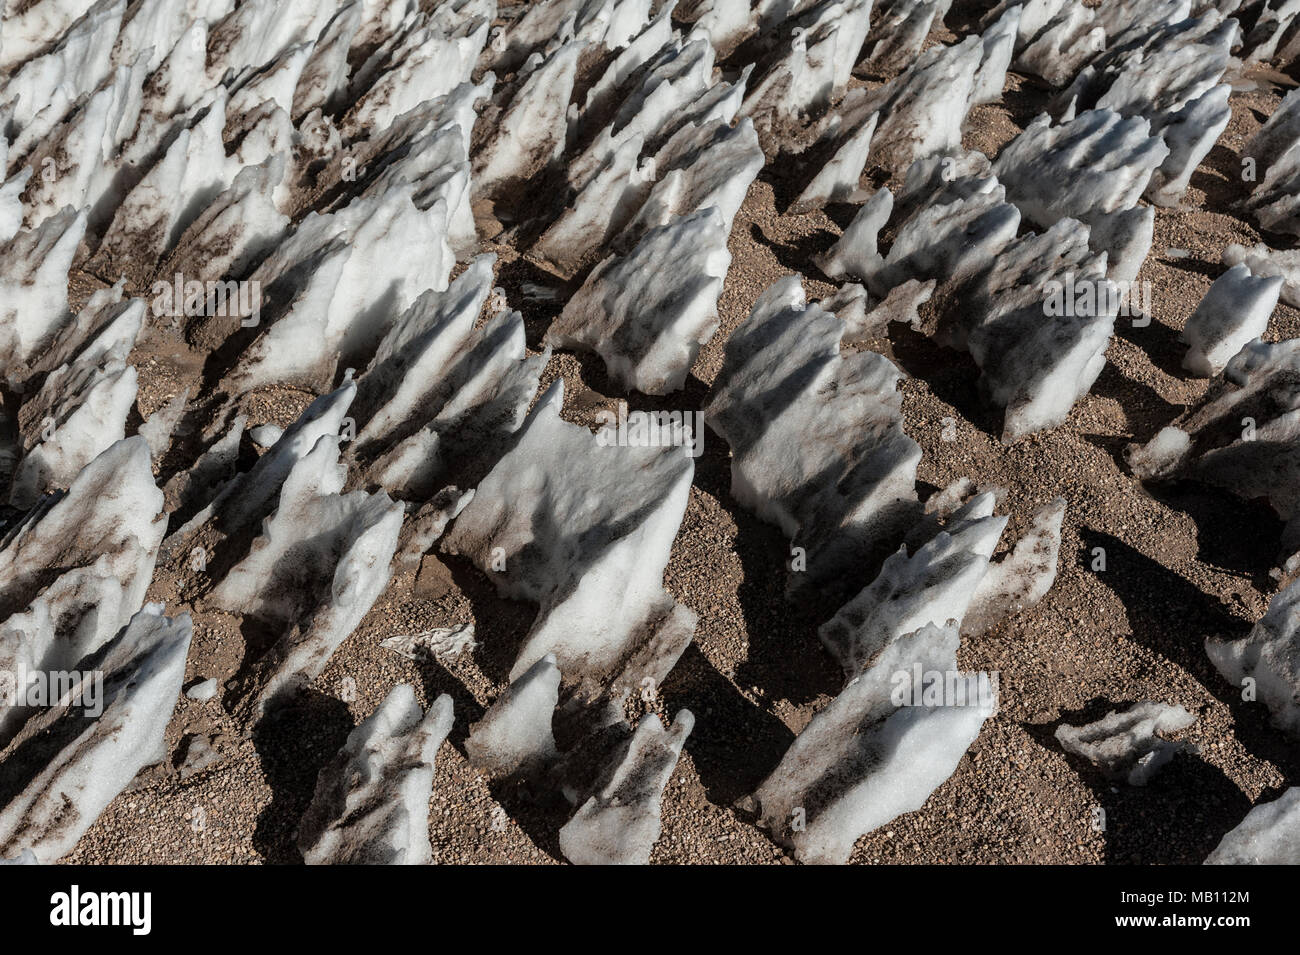 Ice formations in the Siloli desert of Bolivia near the Uyuni salt flat, South America. Stock Photo